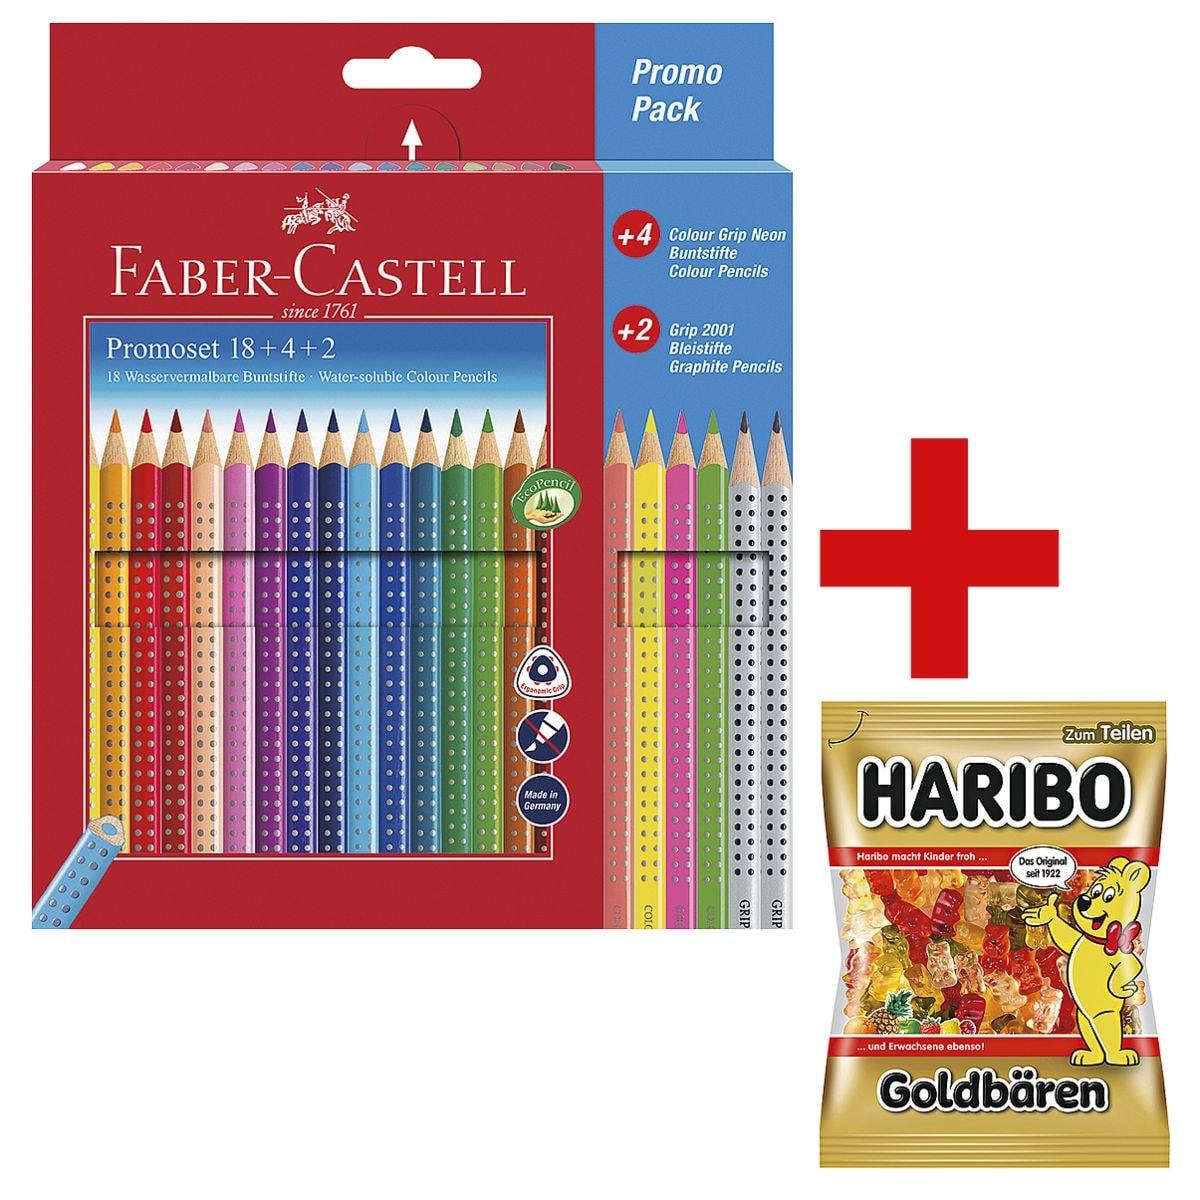 Faber-Castell (Schule) 24-Promo-Pack Buntstifte »Colour GRIP« inkl. Fruchtgummi »Goldbären« 200 g